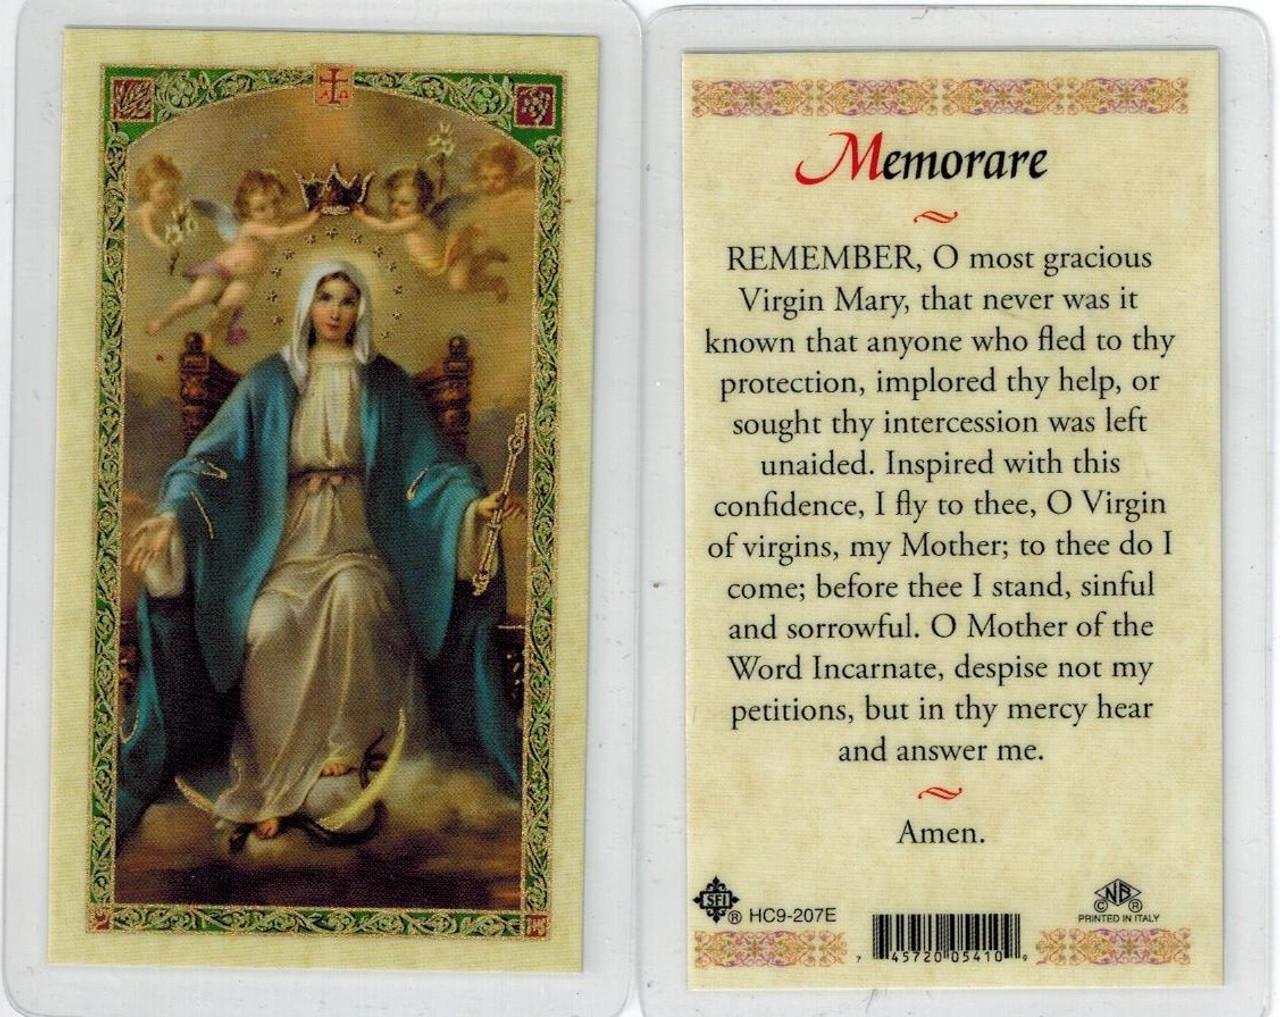 photograph regarding Memorare Prayer Printable identify Memorare, laminated prayer card